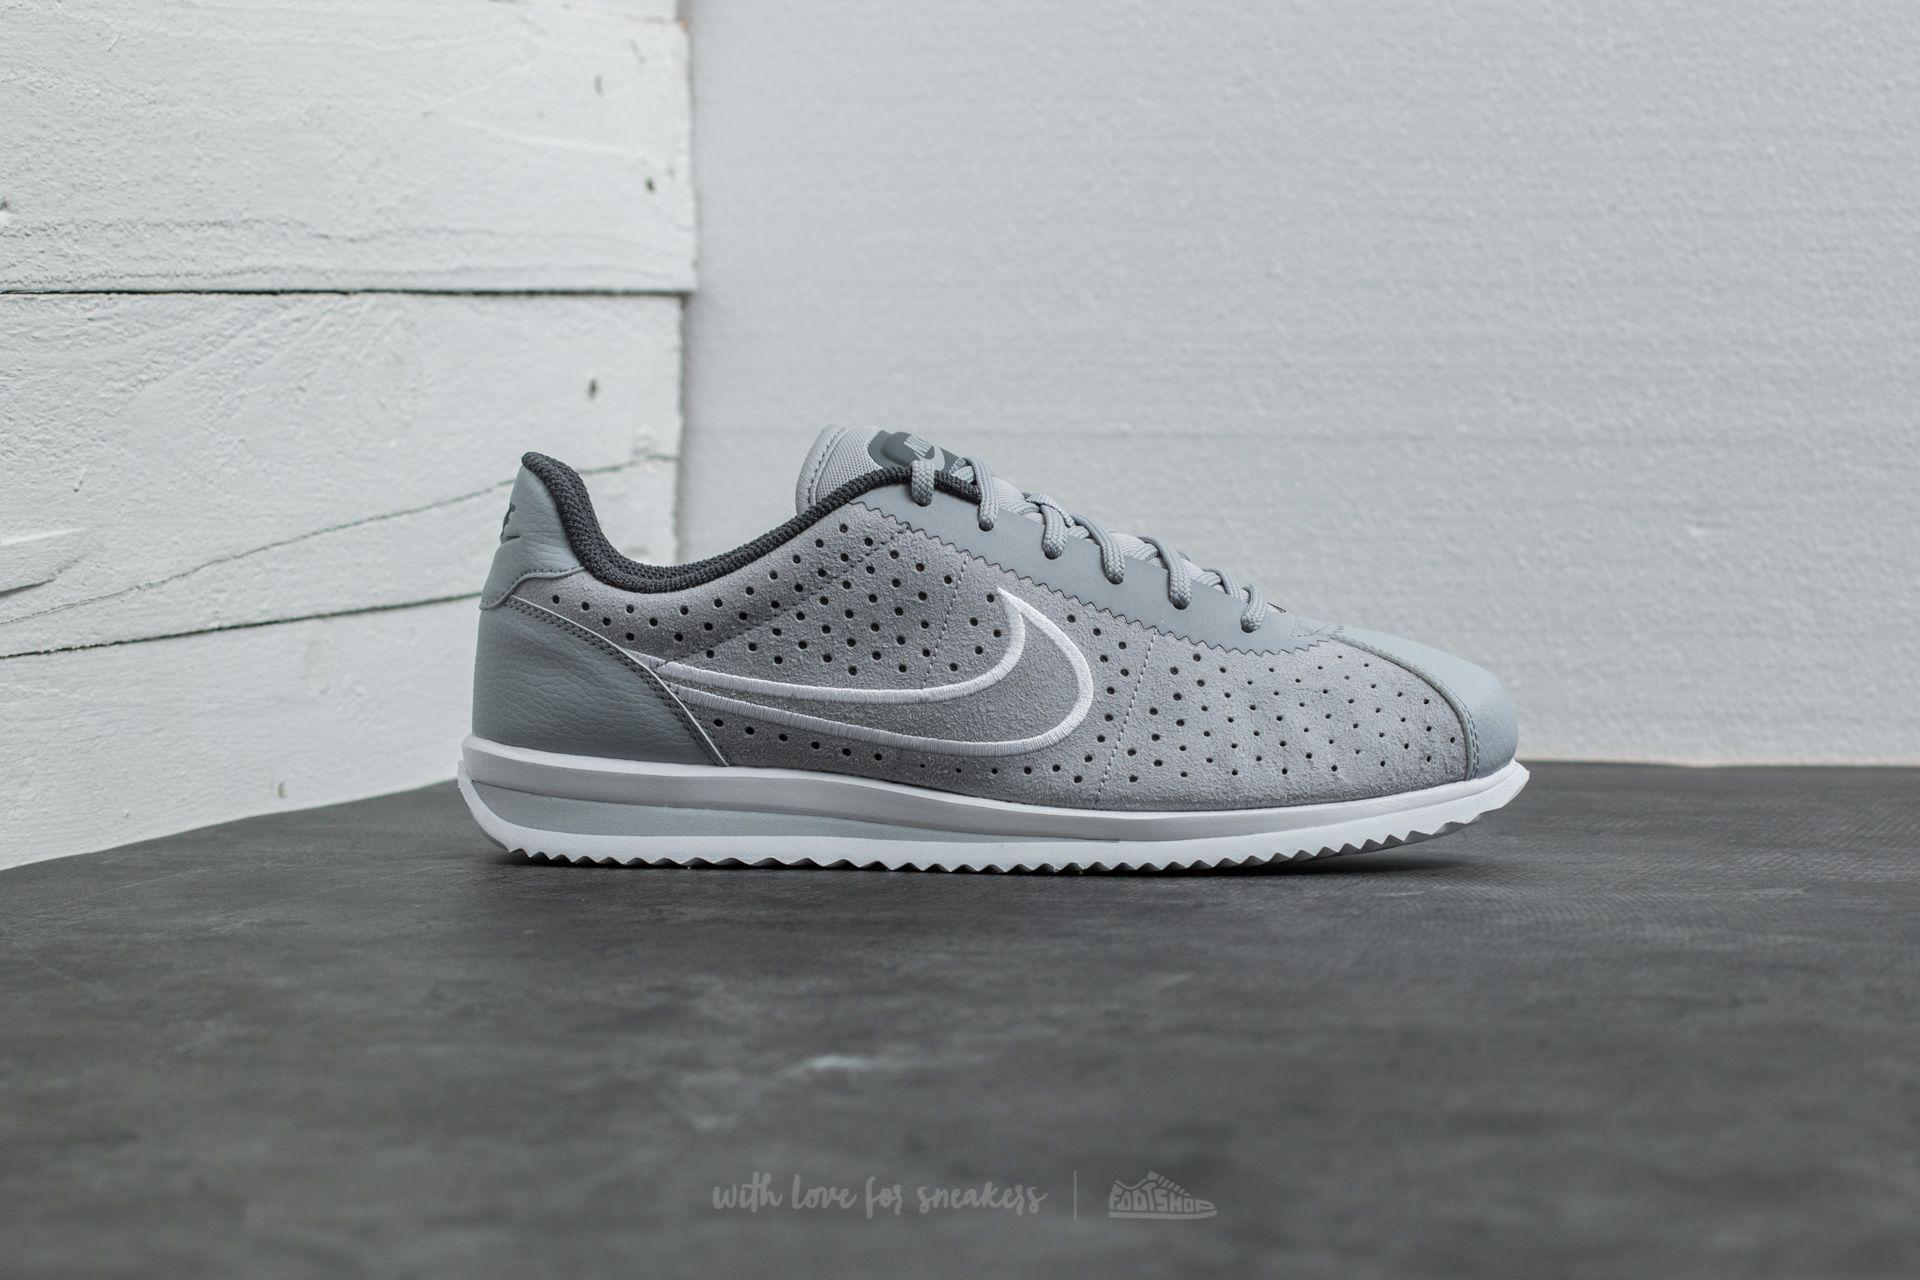 wholesale dealer 438d2 af6c6 ... black) Lyst - Nike Cortez Ultra Moire 2 Wolf Grey White-dark Grey in  Gray . ...